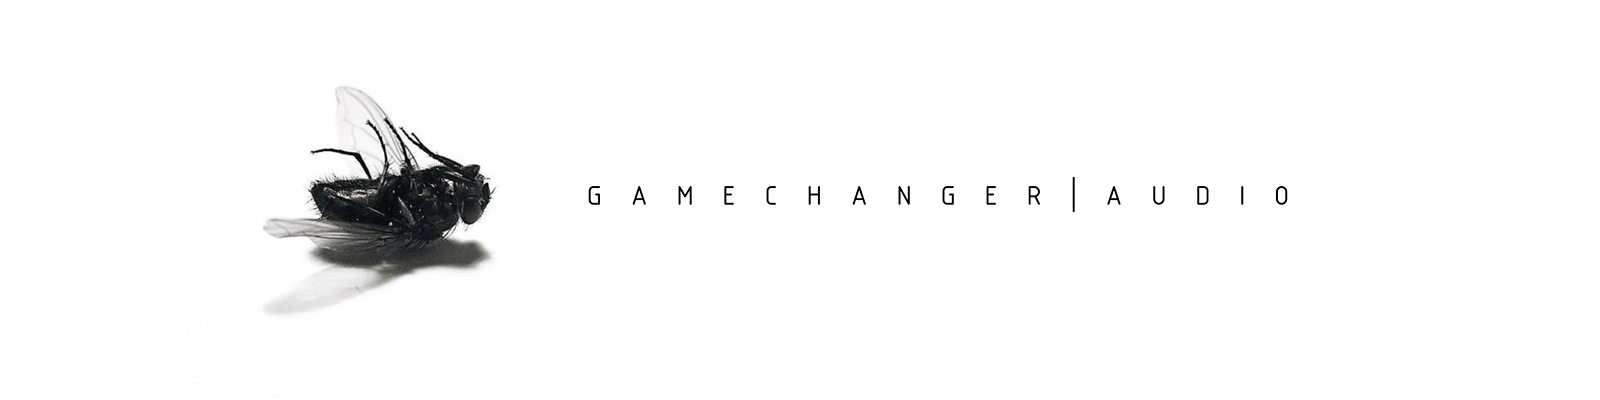 gamecahnger-1600x-400.jpg